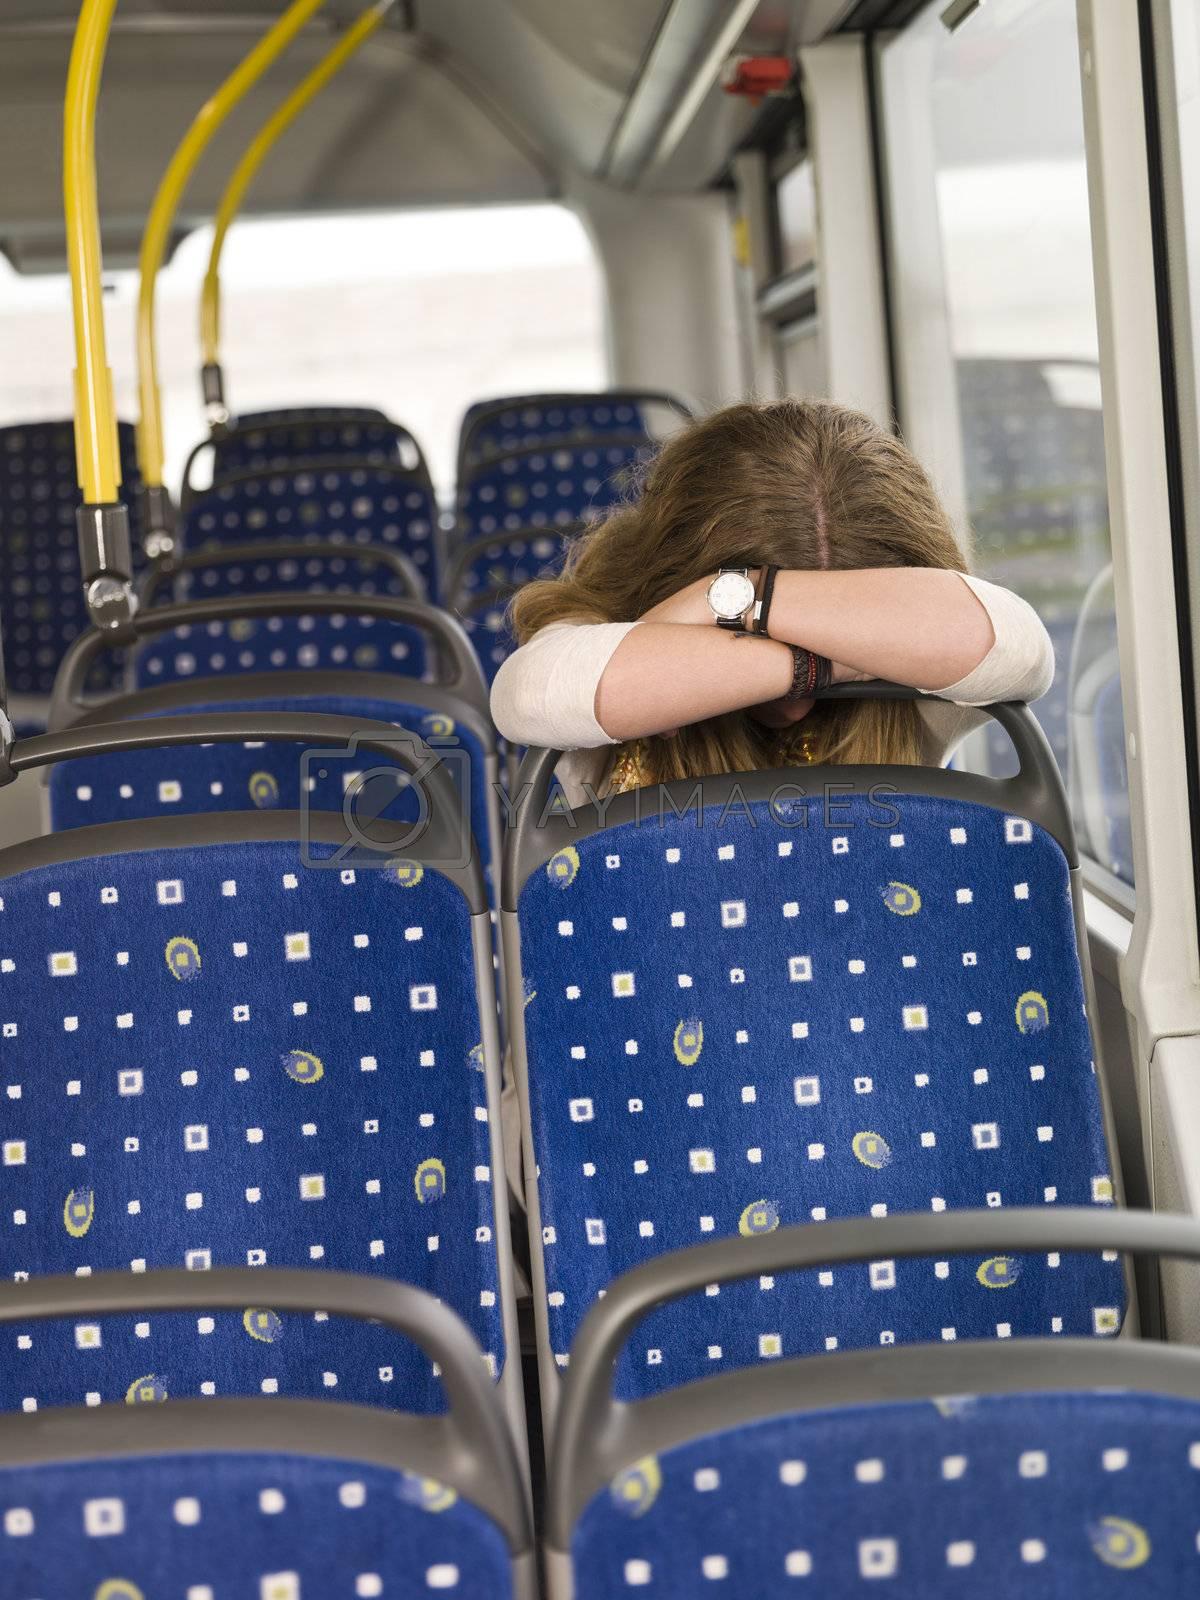 Sad woman alone on the bus